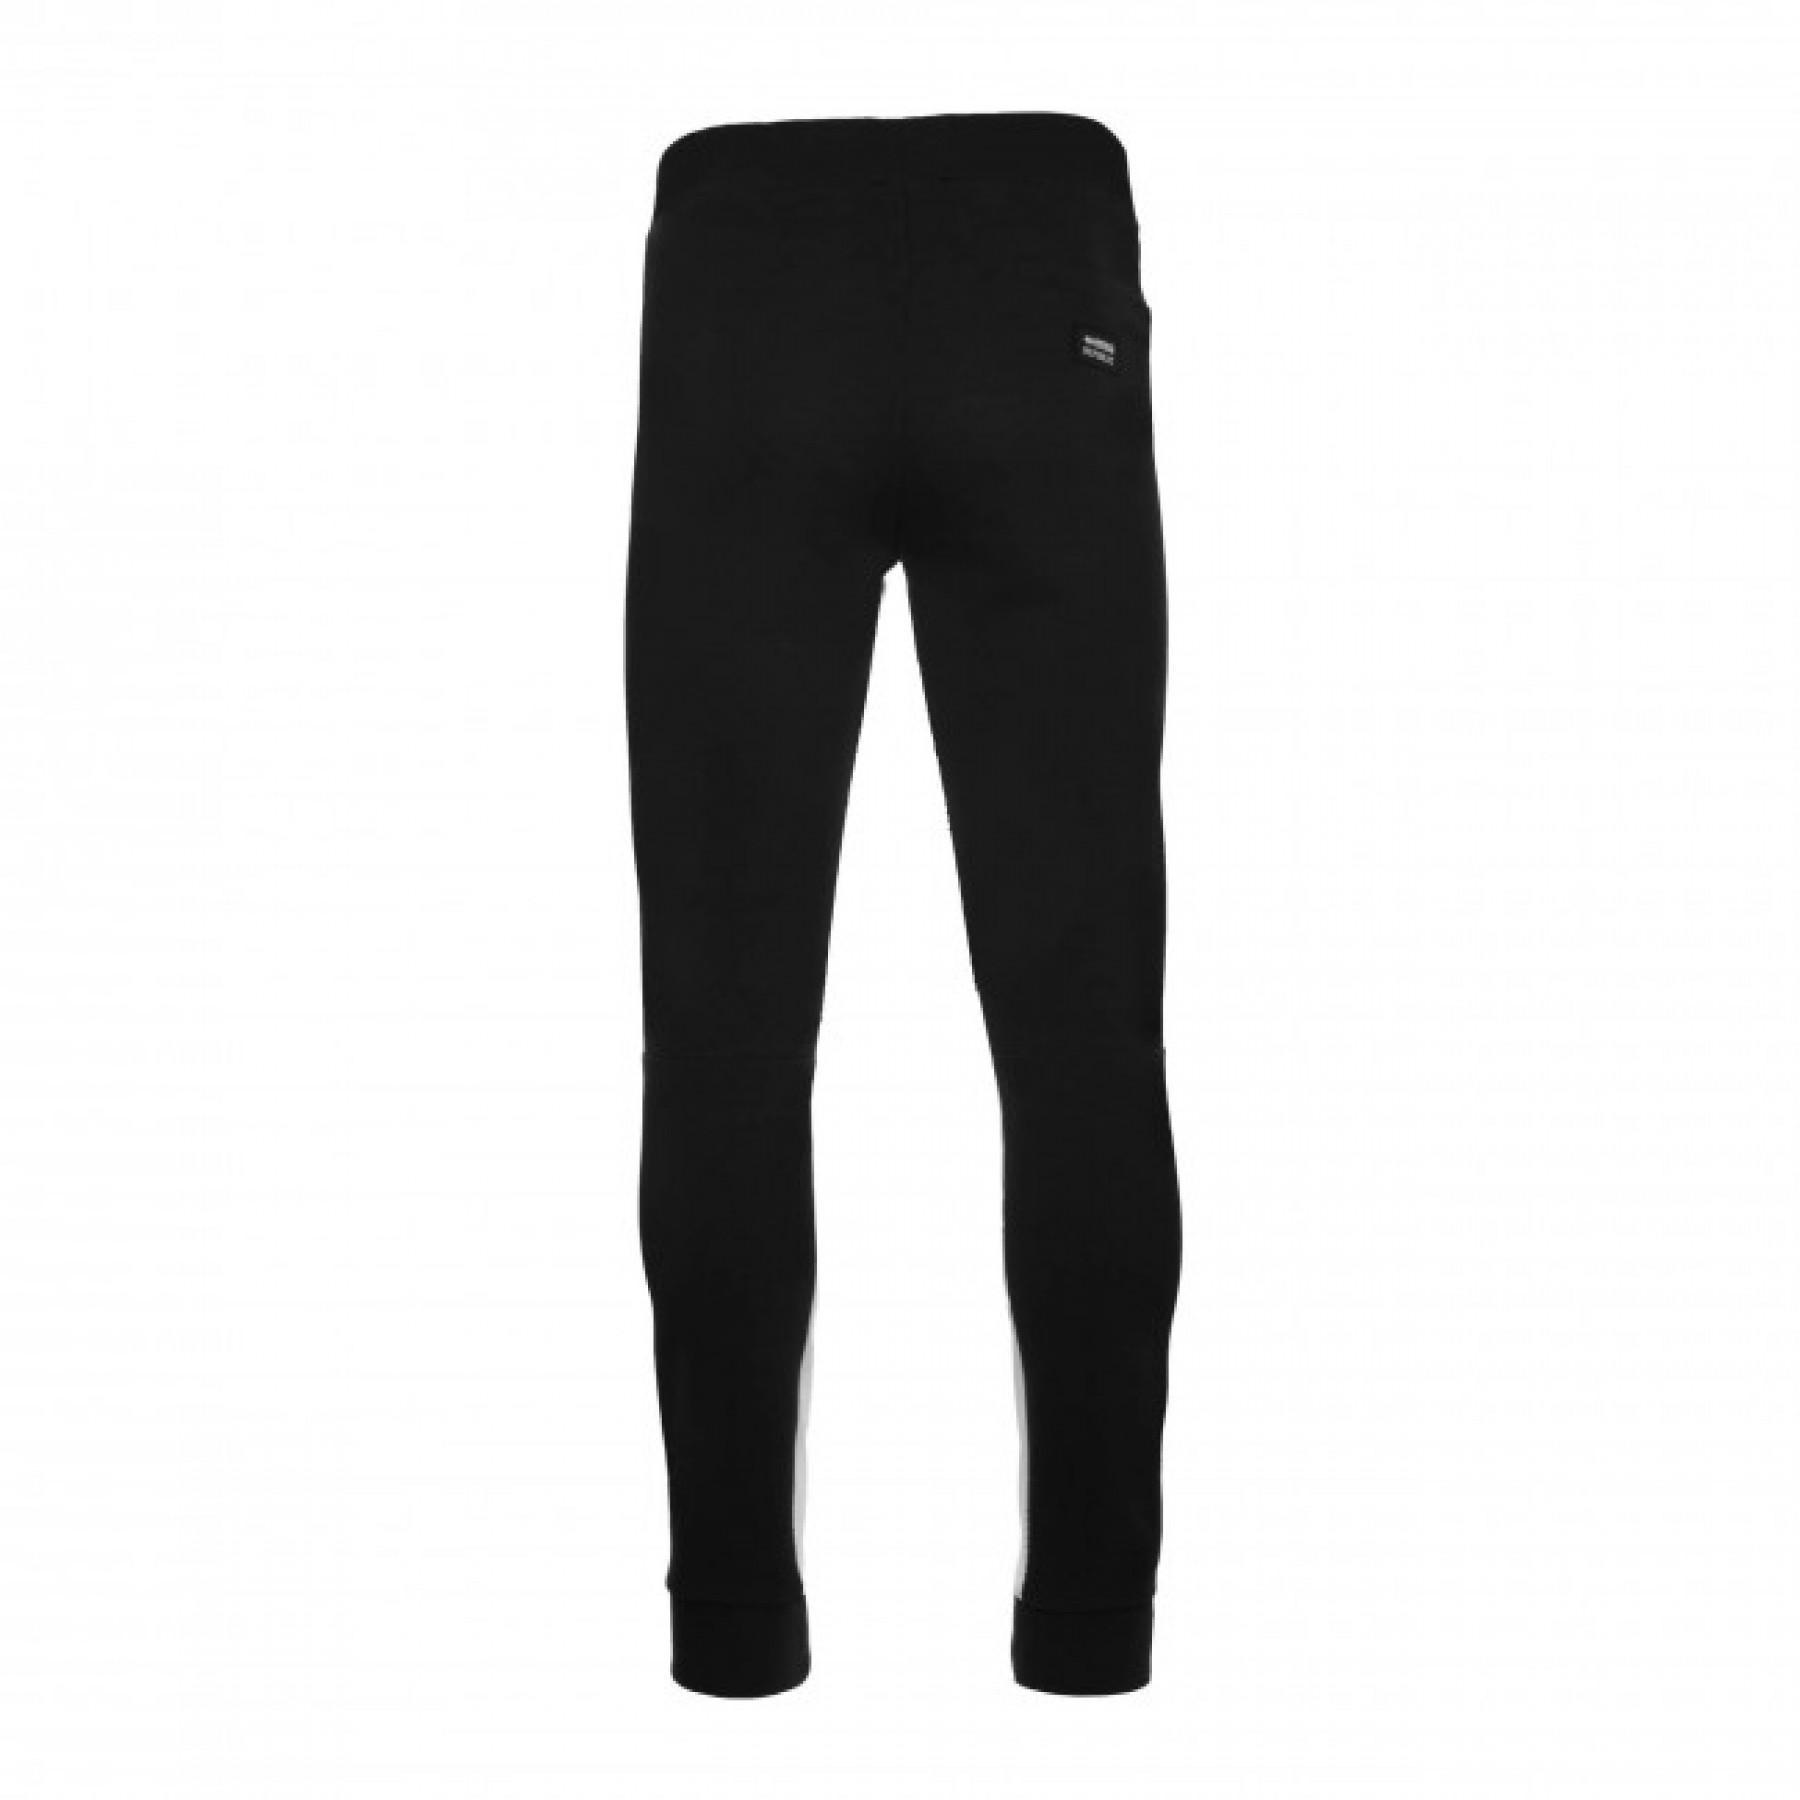 Errea Sport Pants merger united lines